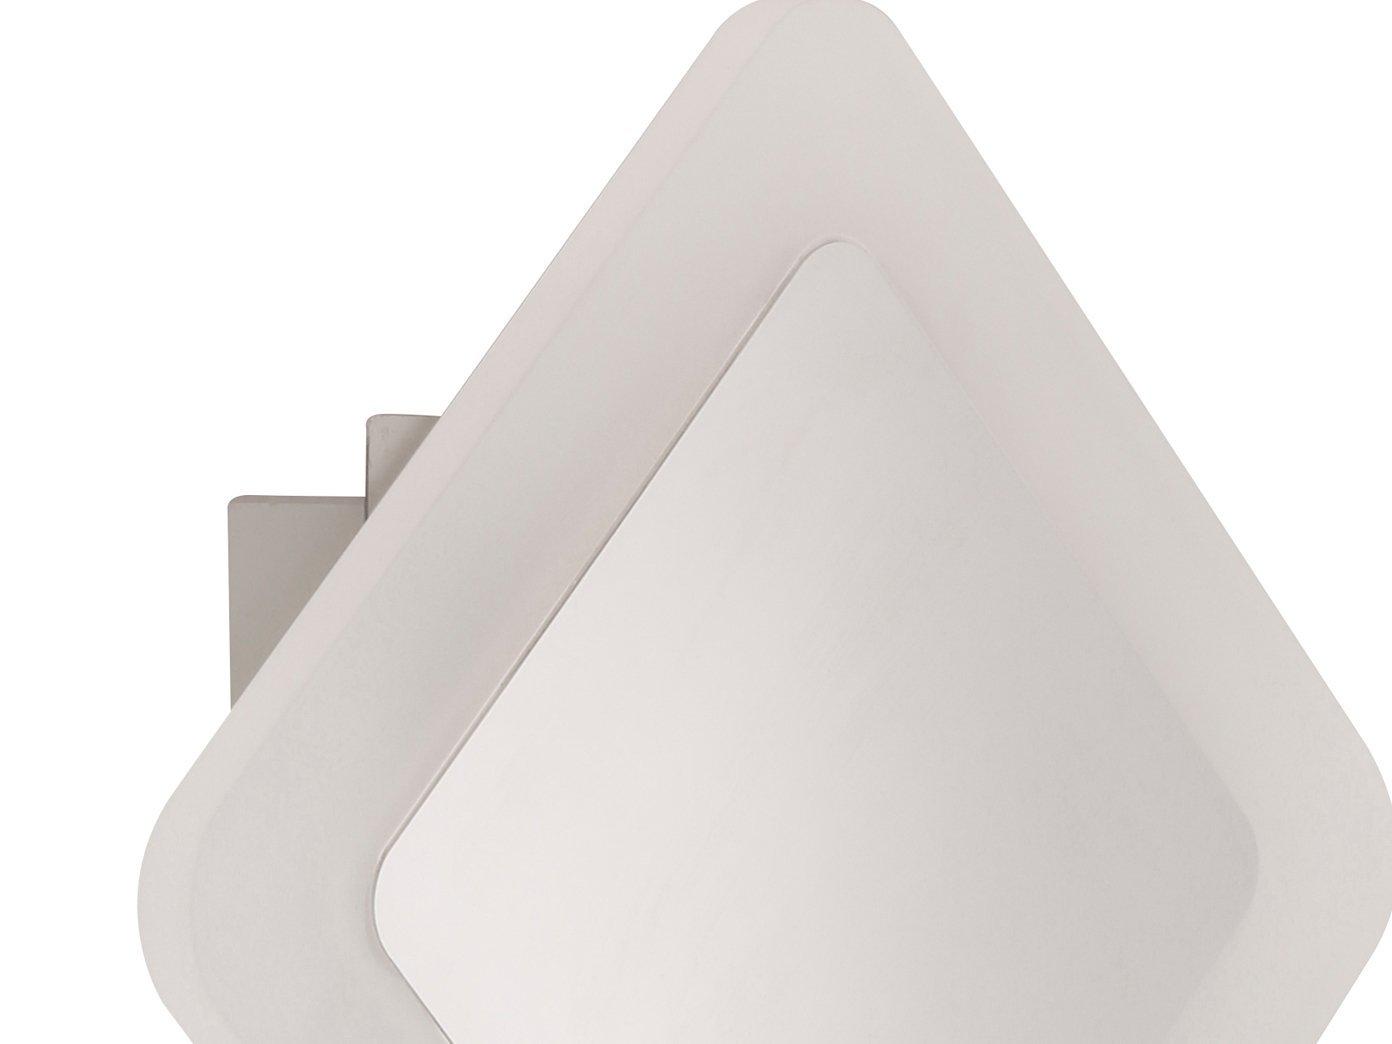 WOFI Deckenleuchte, Deckenleuchte, Deckenleuchte, Stahl^Acryl, Integriert, 23 W b66dfe